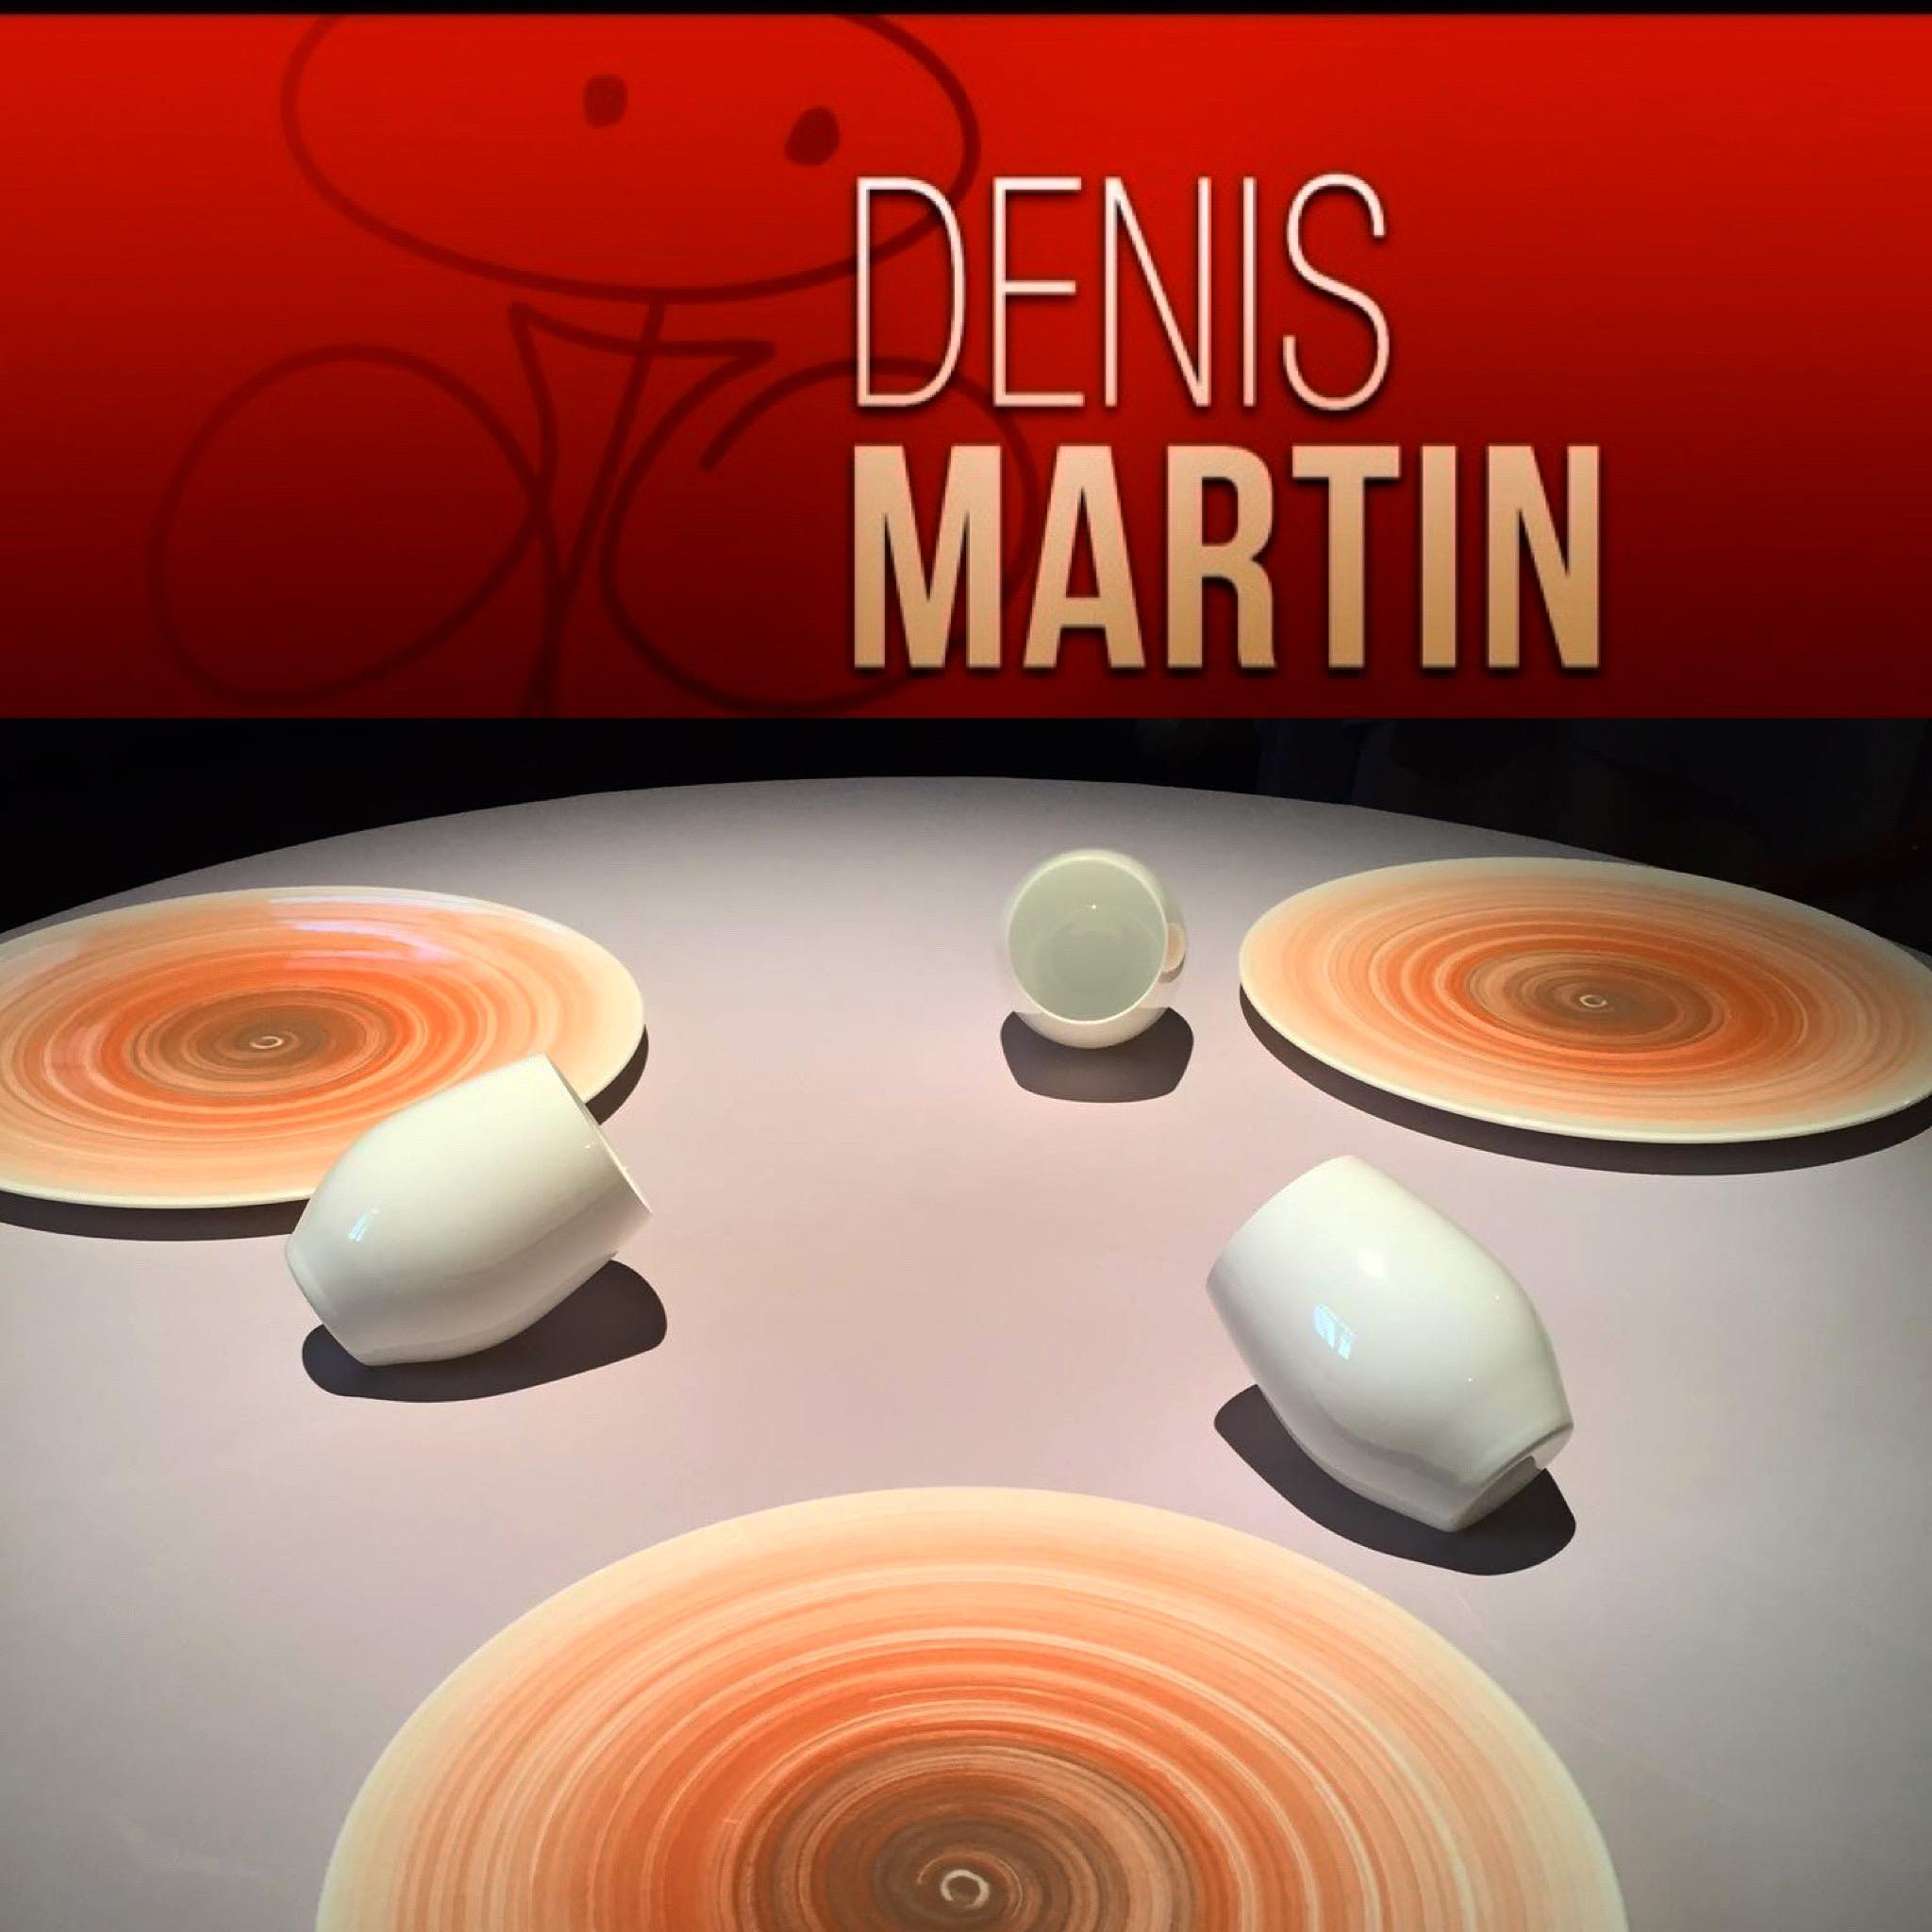 Denis_Martin_Bon_-25734-2GGV8.pdf